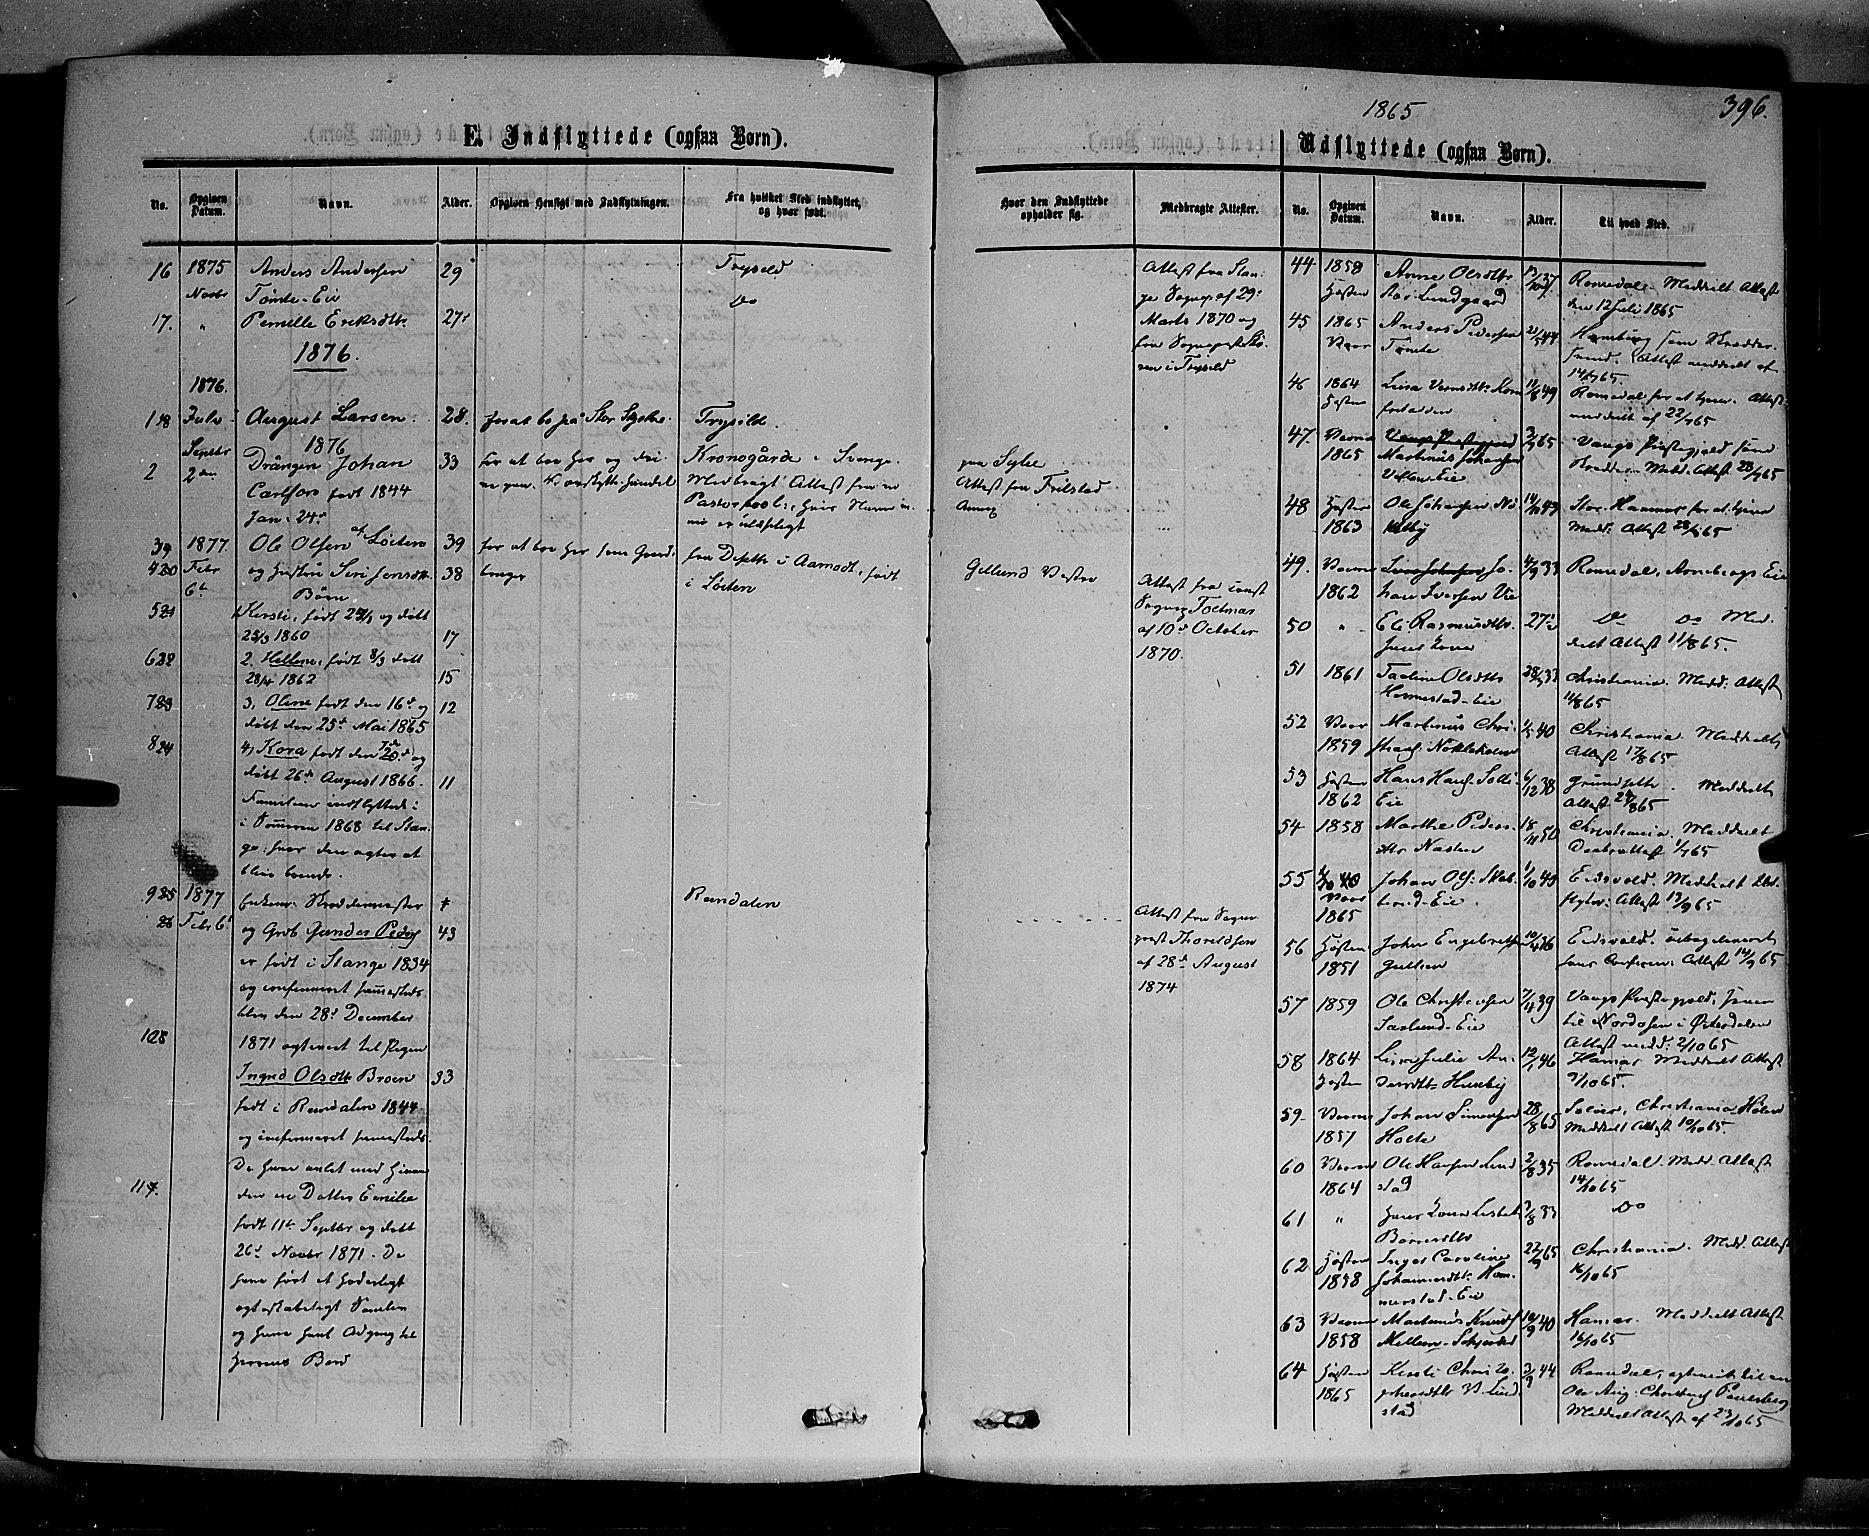 SAH, Stange prestekontor, K/L0013: Ministerialbok nr. 13, 1862-1879, s. 396